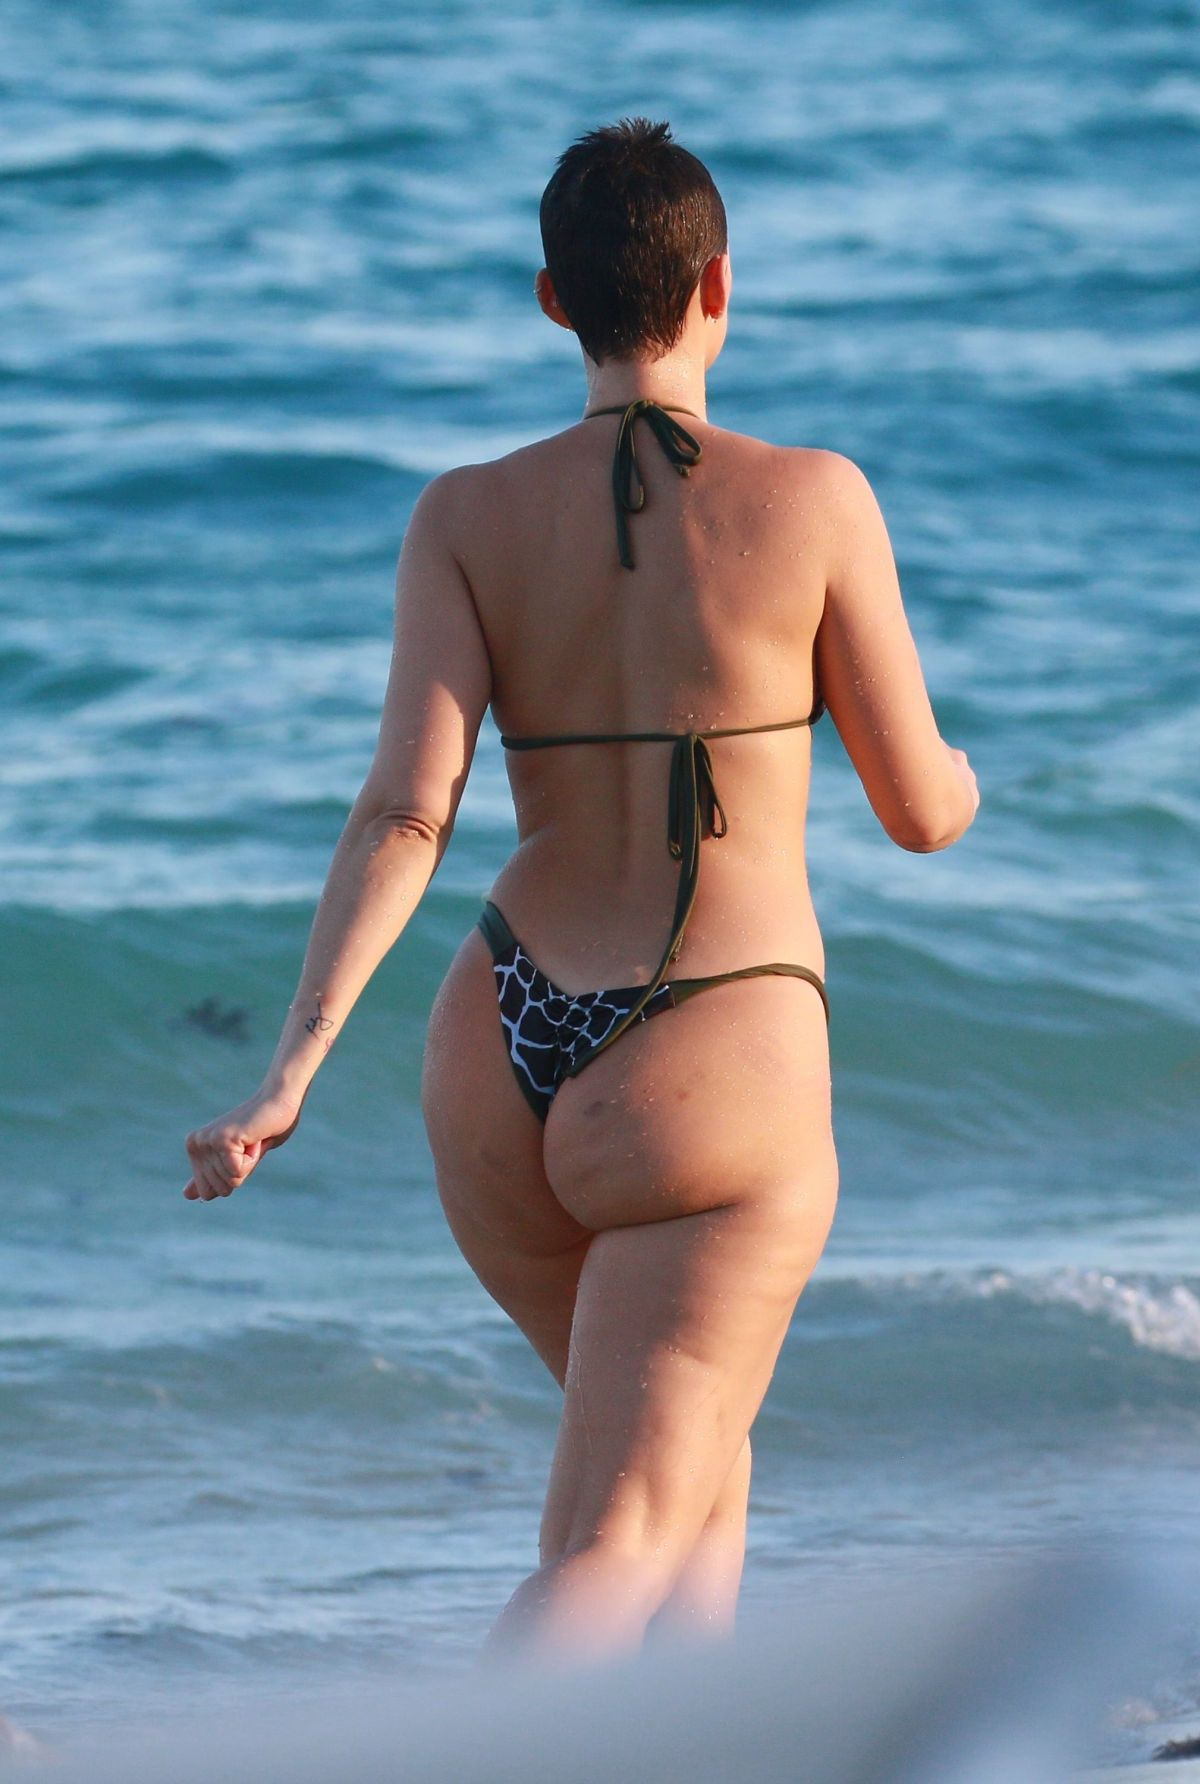 Julz Goddard nude (56 fotos) Feet, Facebook, legs